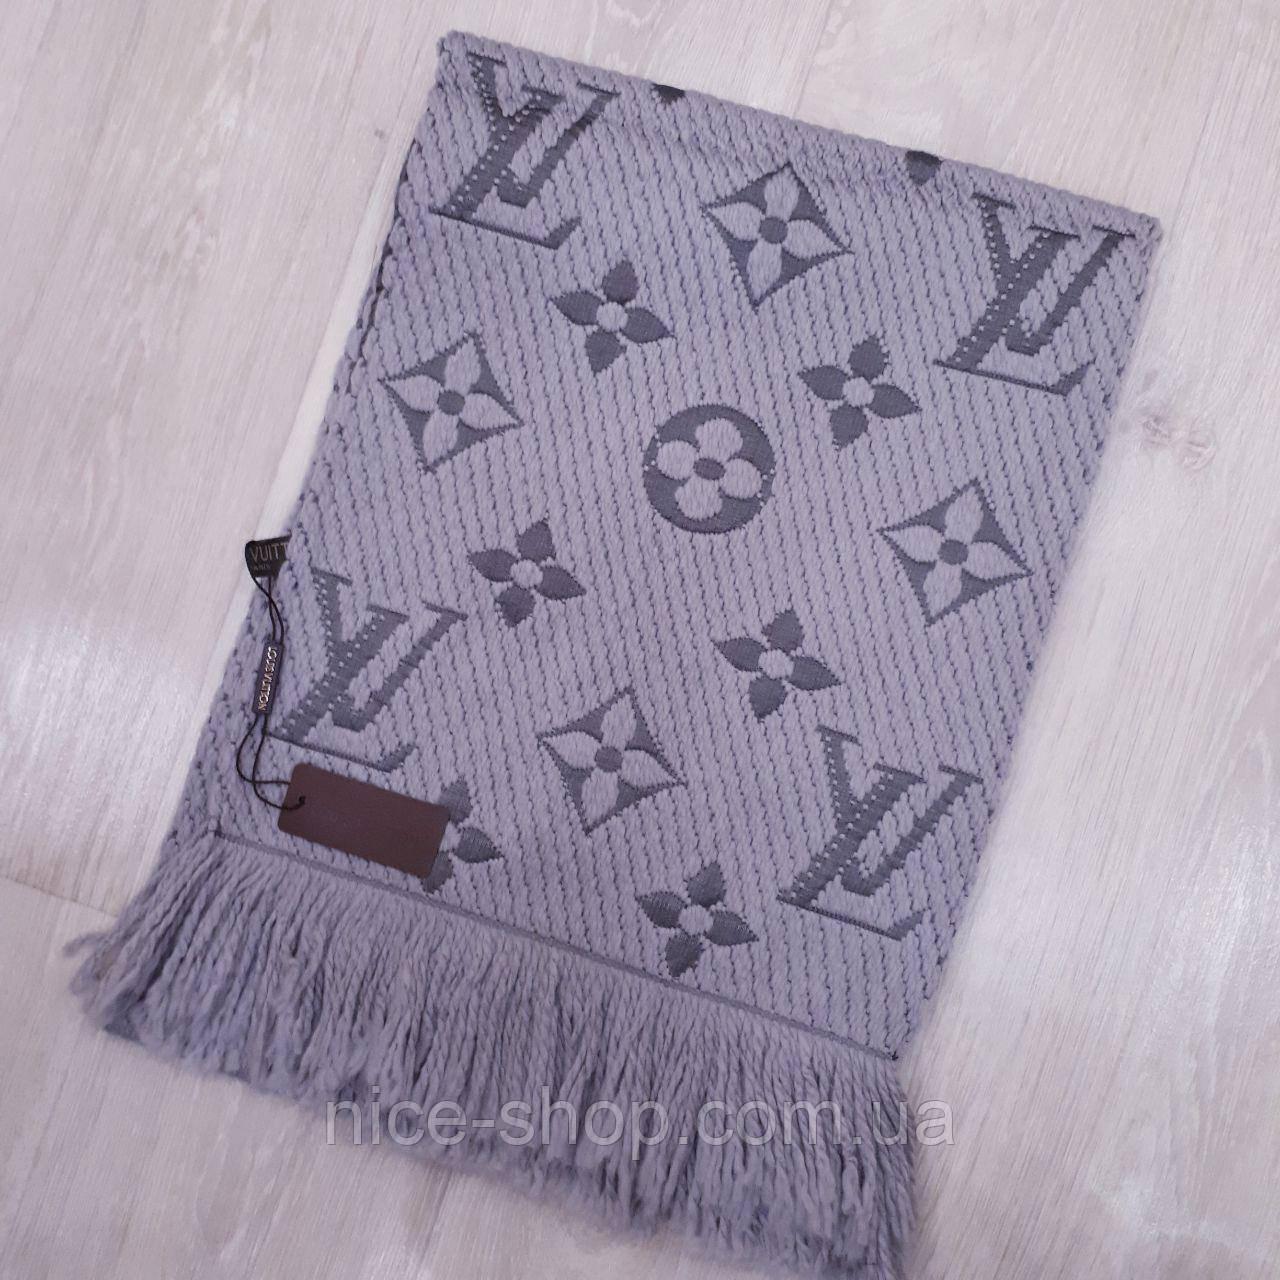 a58f8eae7acc Шарф Louis Vuitton серый  продажа, цена в Одессе. шарфы от